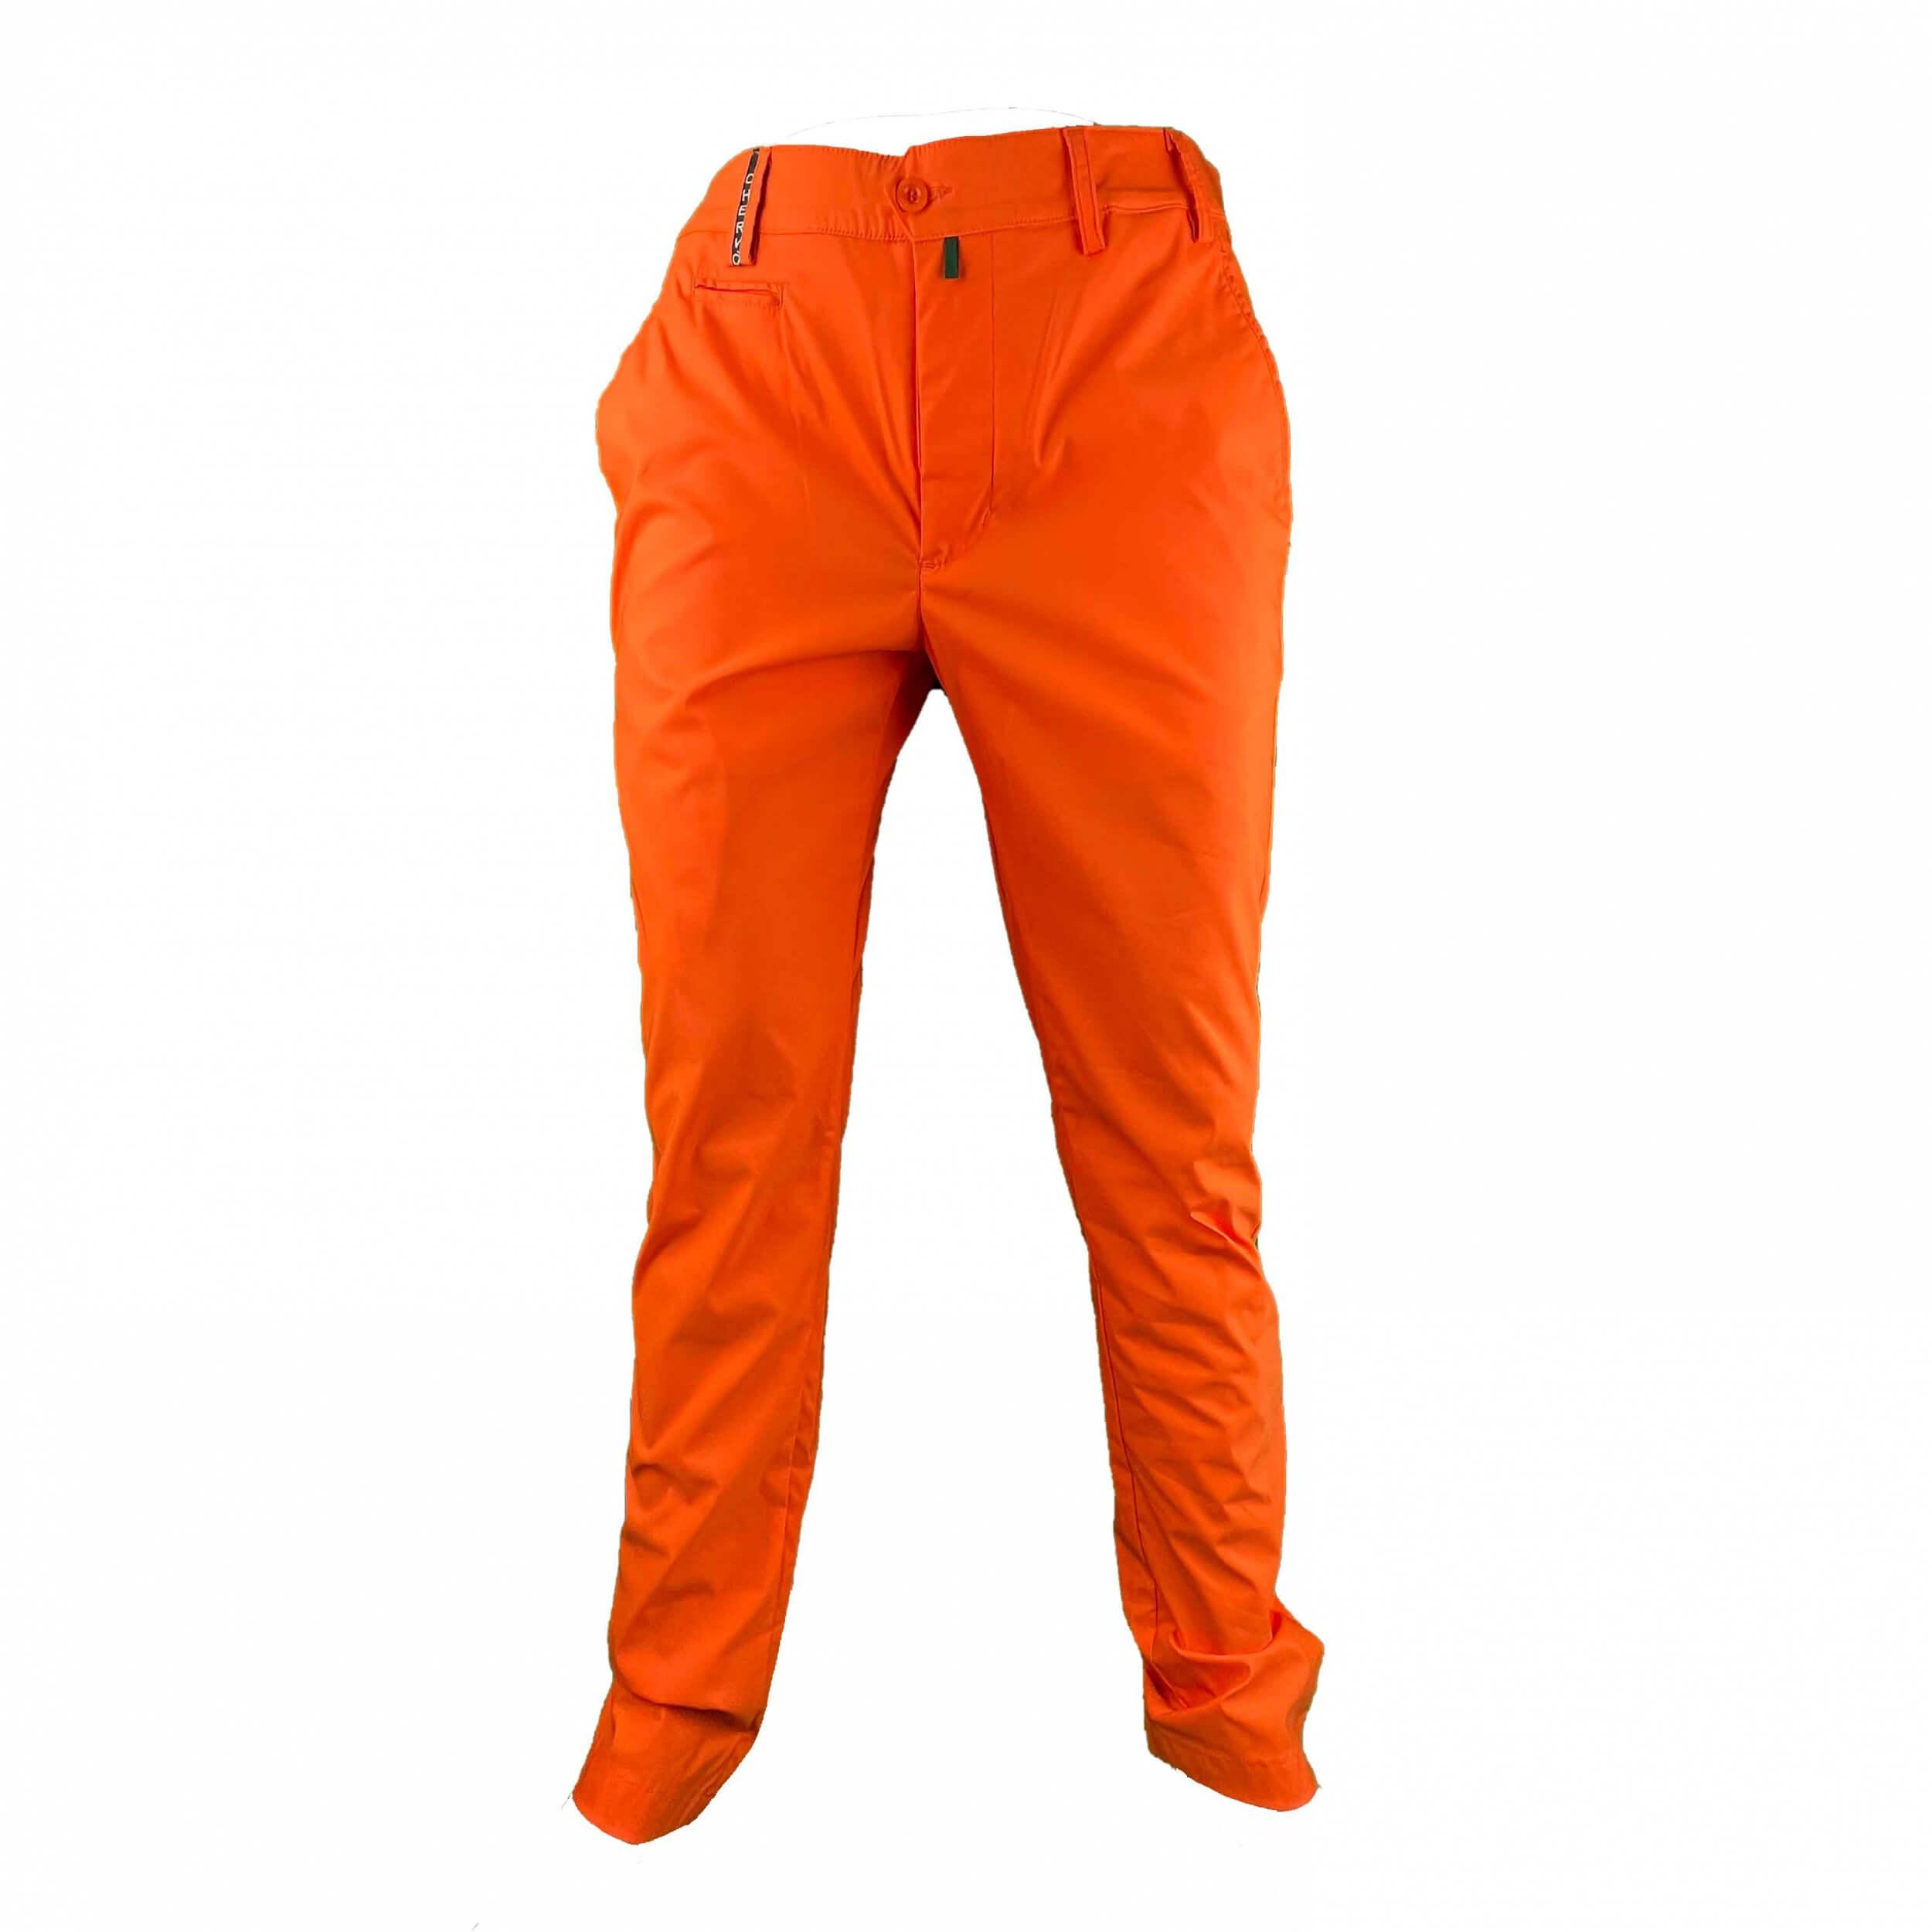 Chervo Herren Hose Spelly DRY MATIC plasmatic orange 367